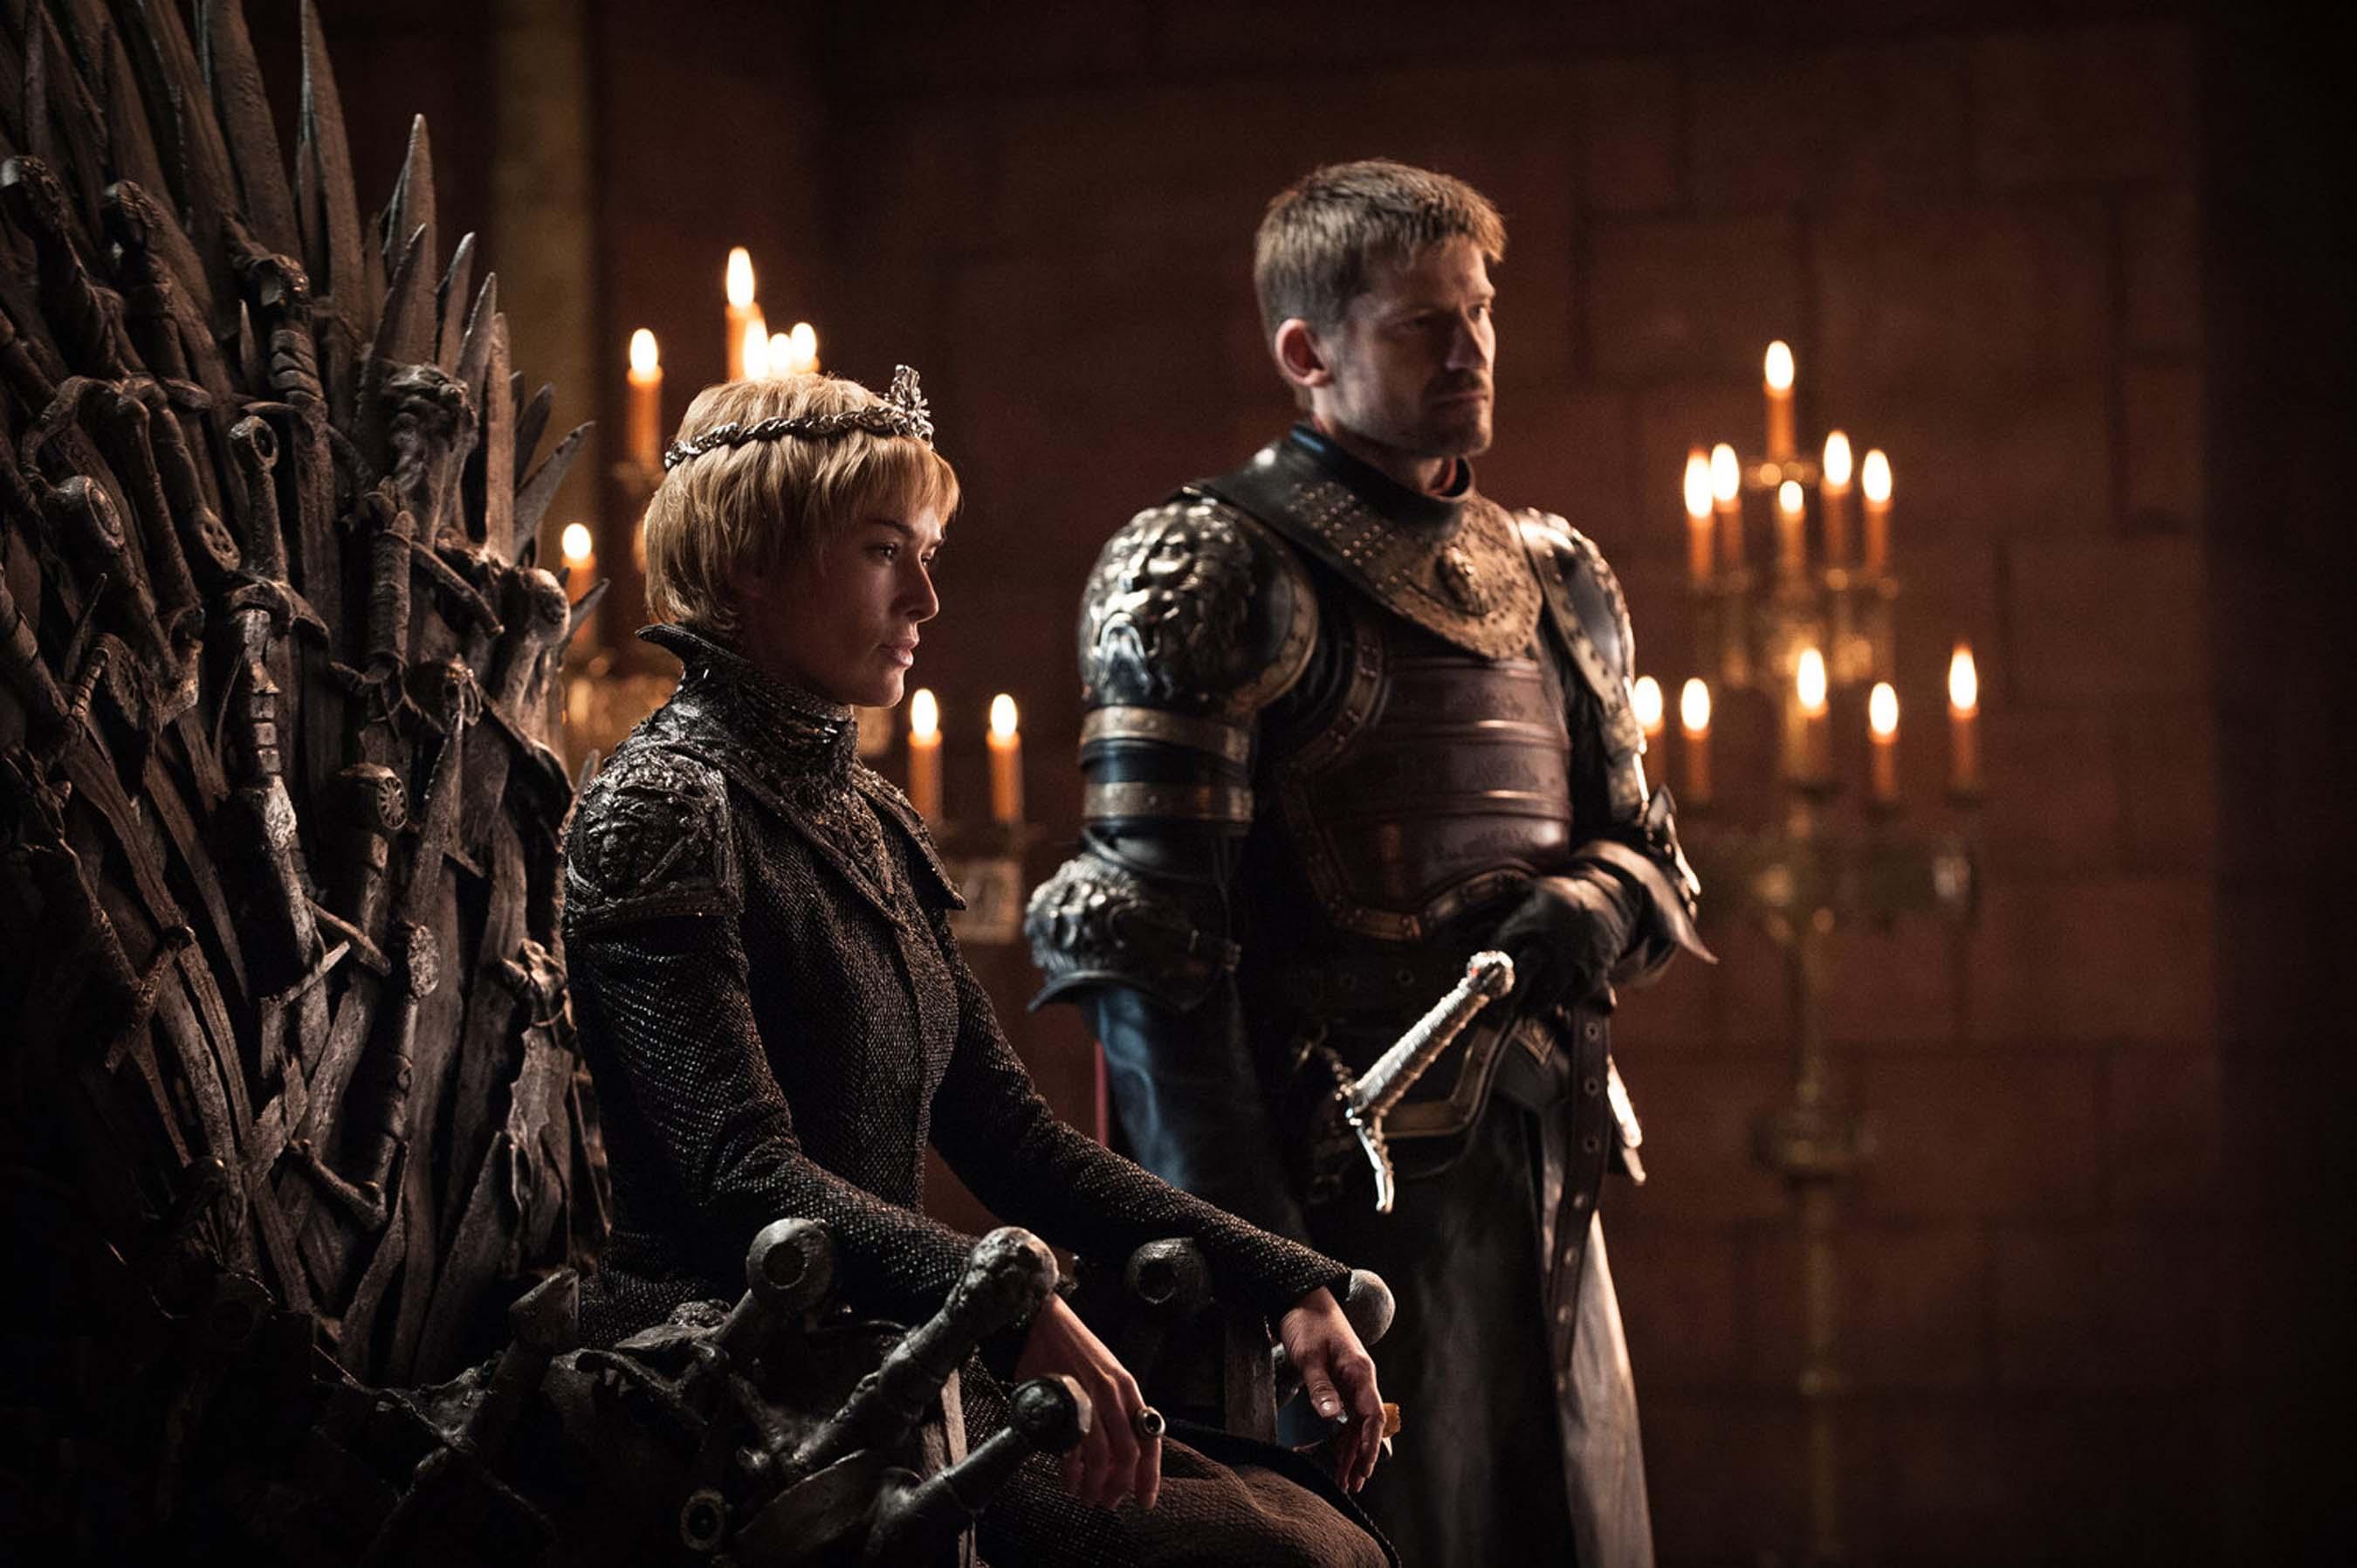 Game of thrones air date in Australia